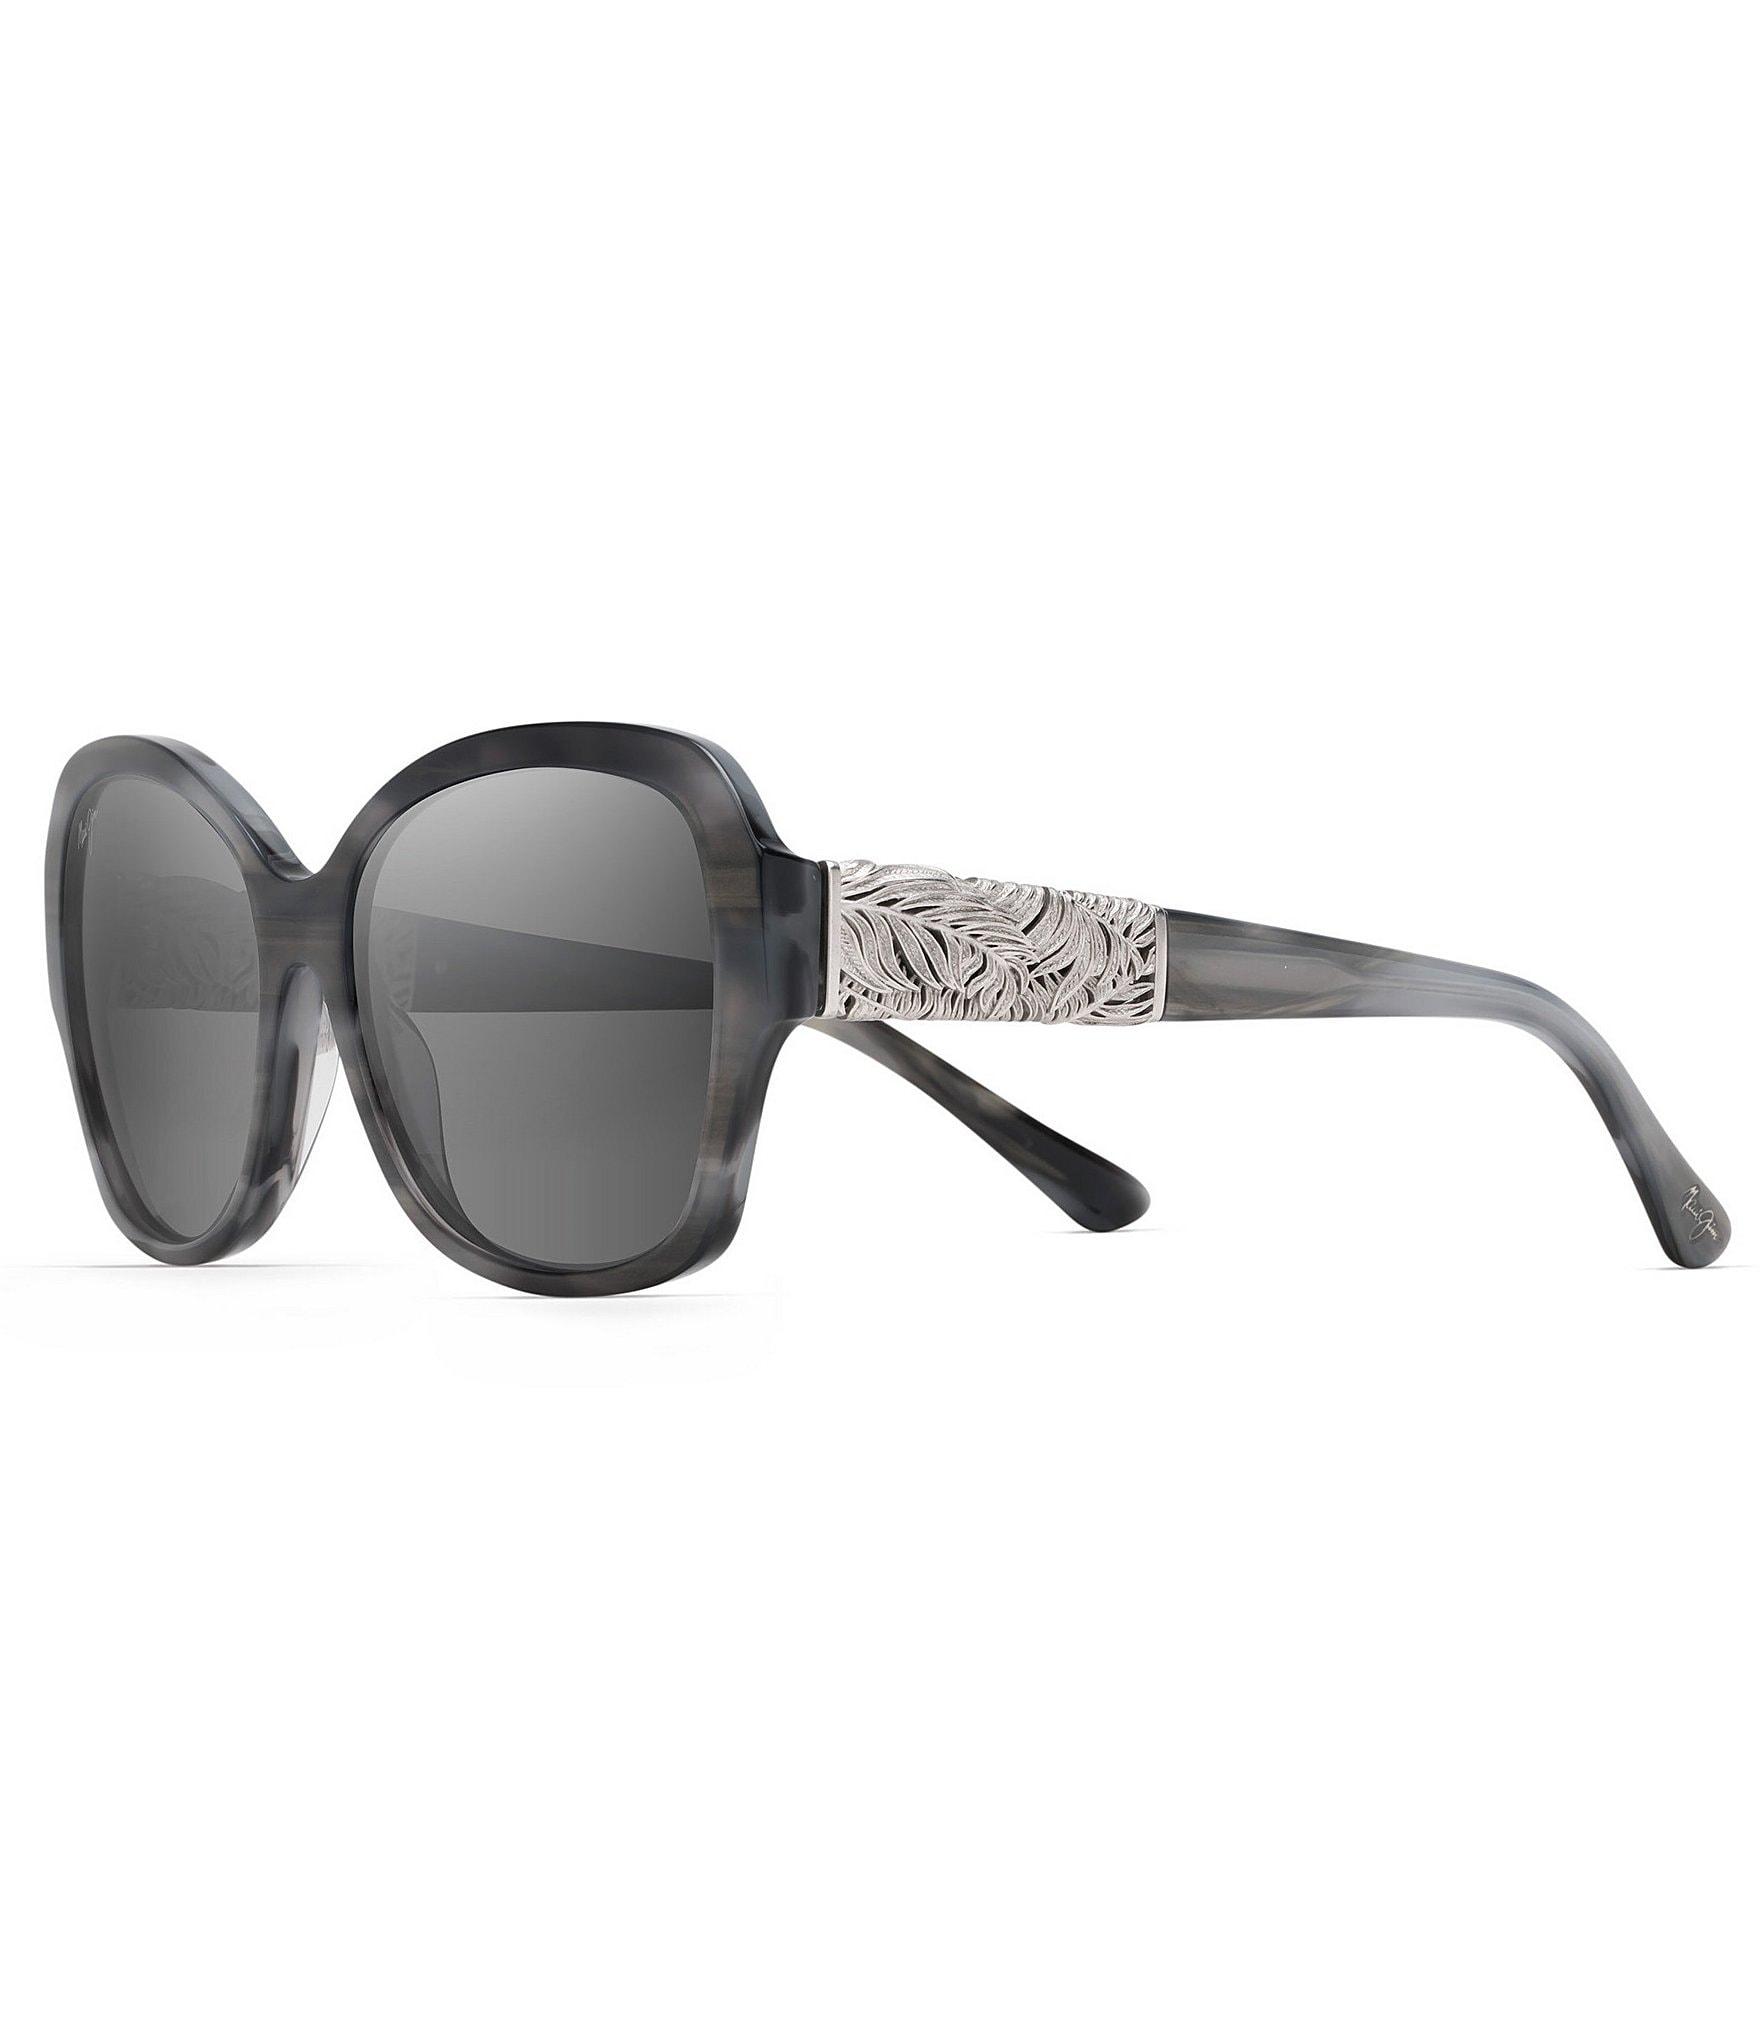 e82c0077c2656 Maui Jim Swaying Palms Polarized Fashion Sunglasses | Dillard's